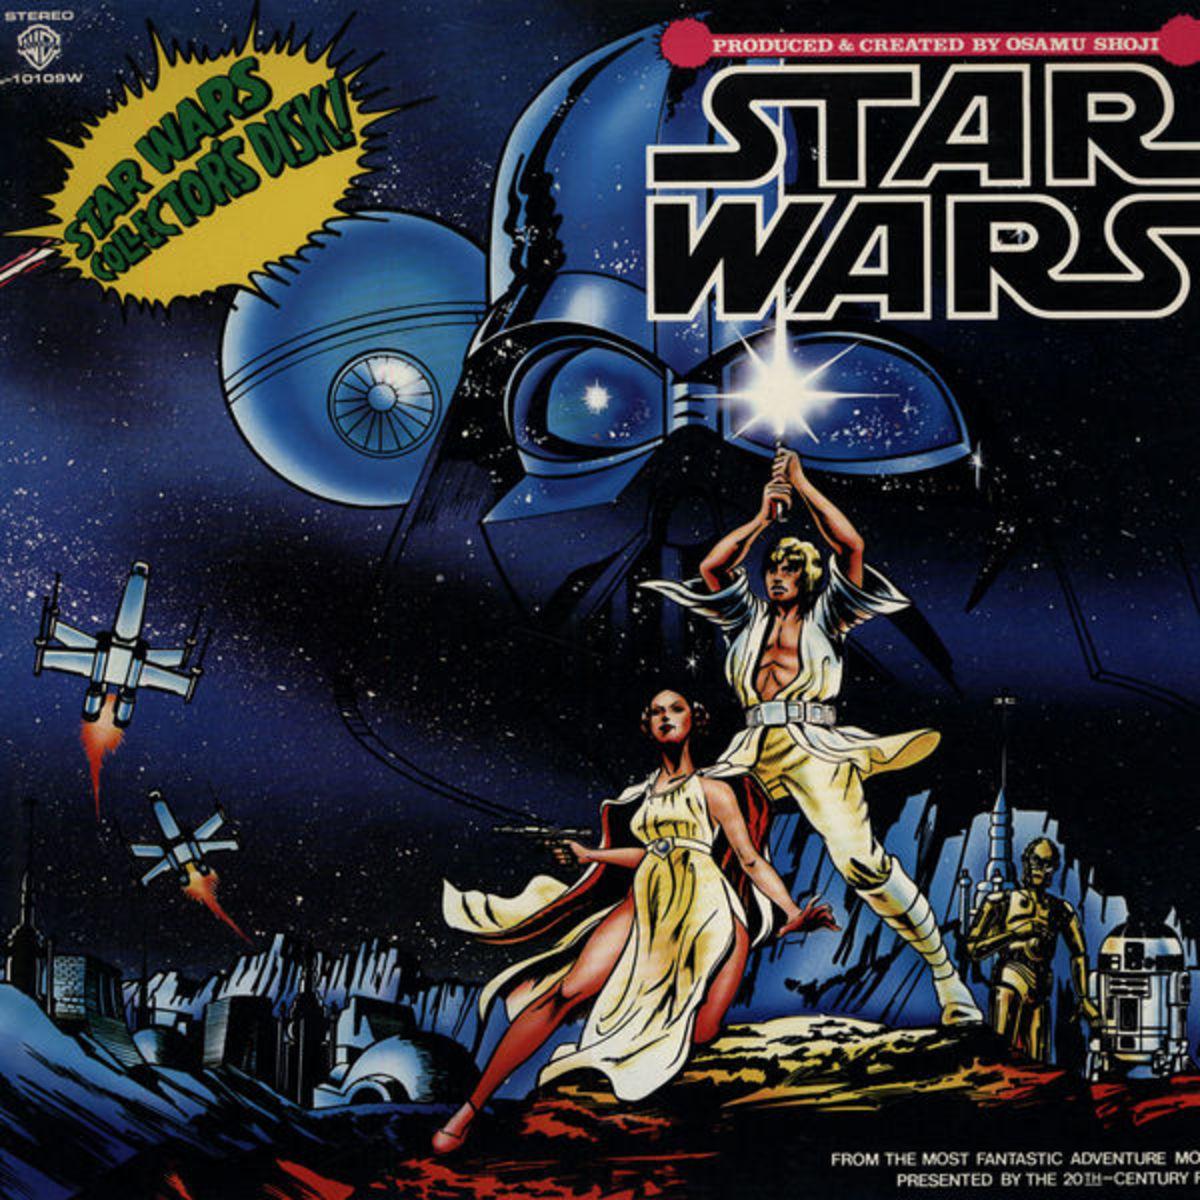 "Osamu Shoji ""Star Wars"" Warner Brothers Records  L-10109W 12"" LP Vinyl Record, Japanese Pressing (1978)"